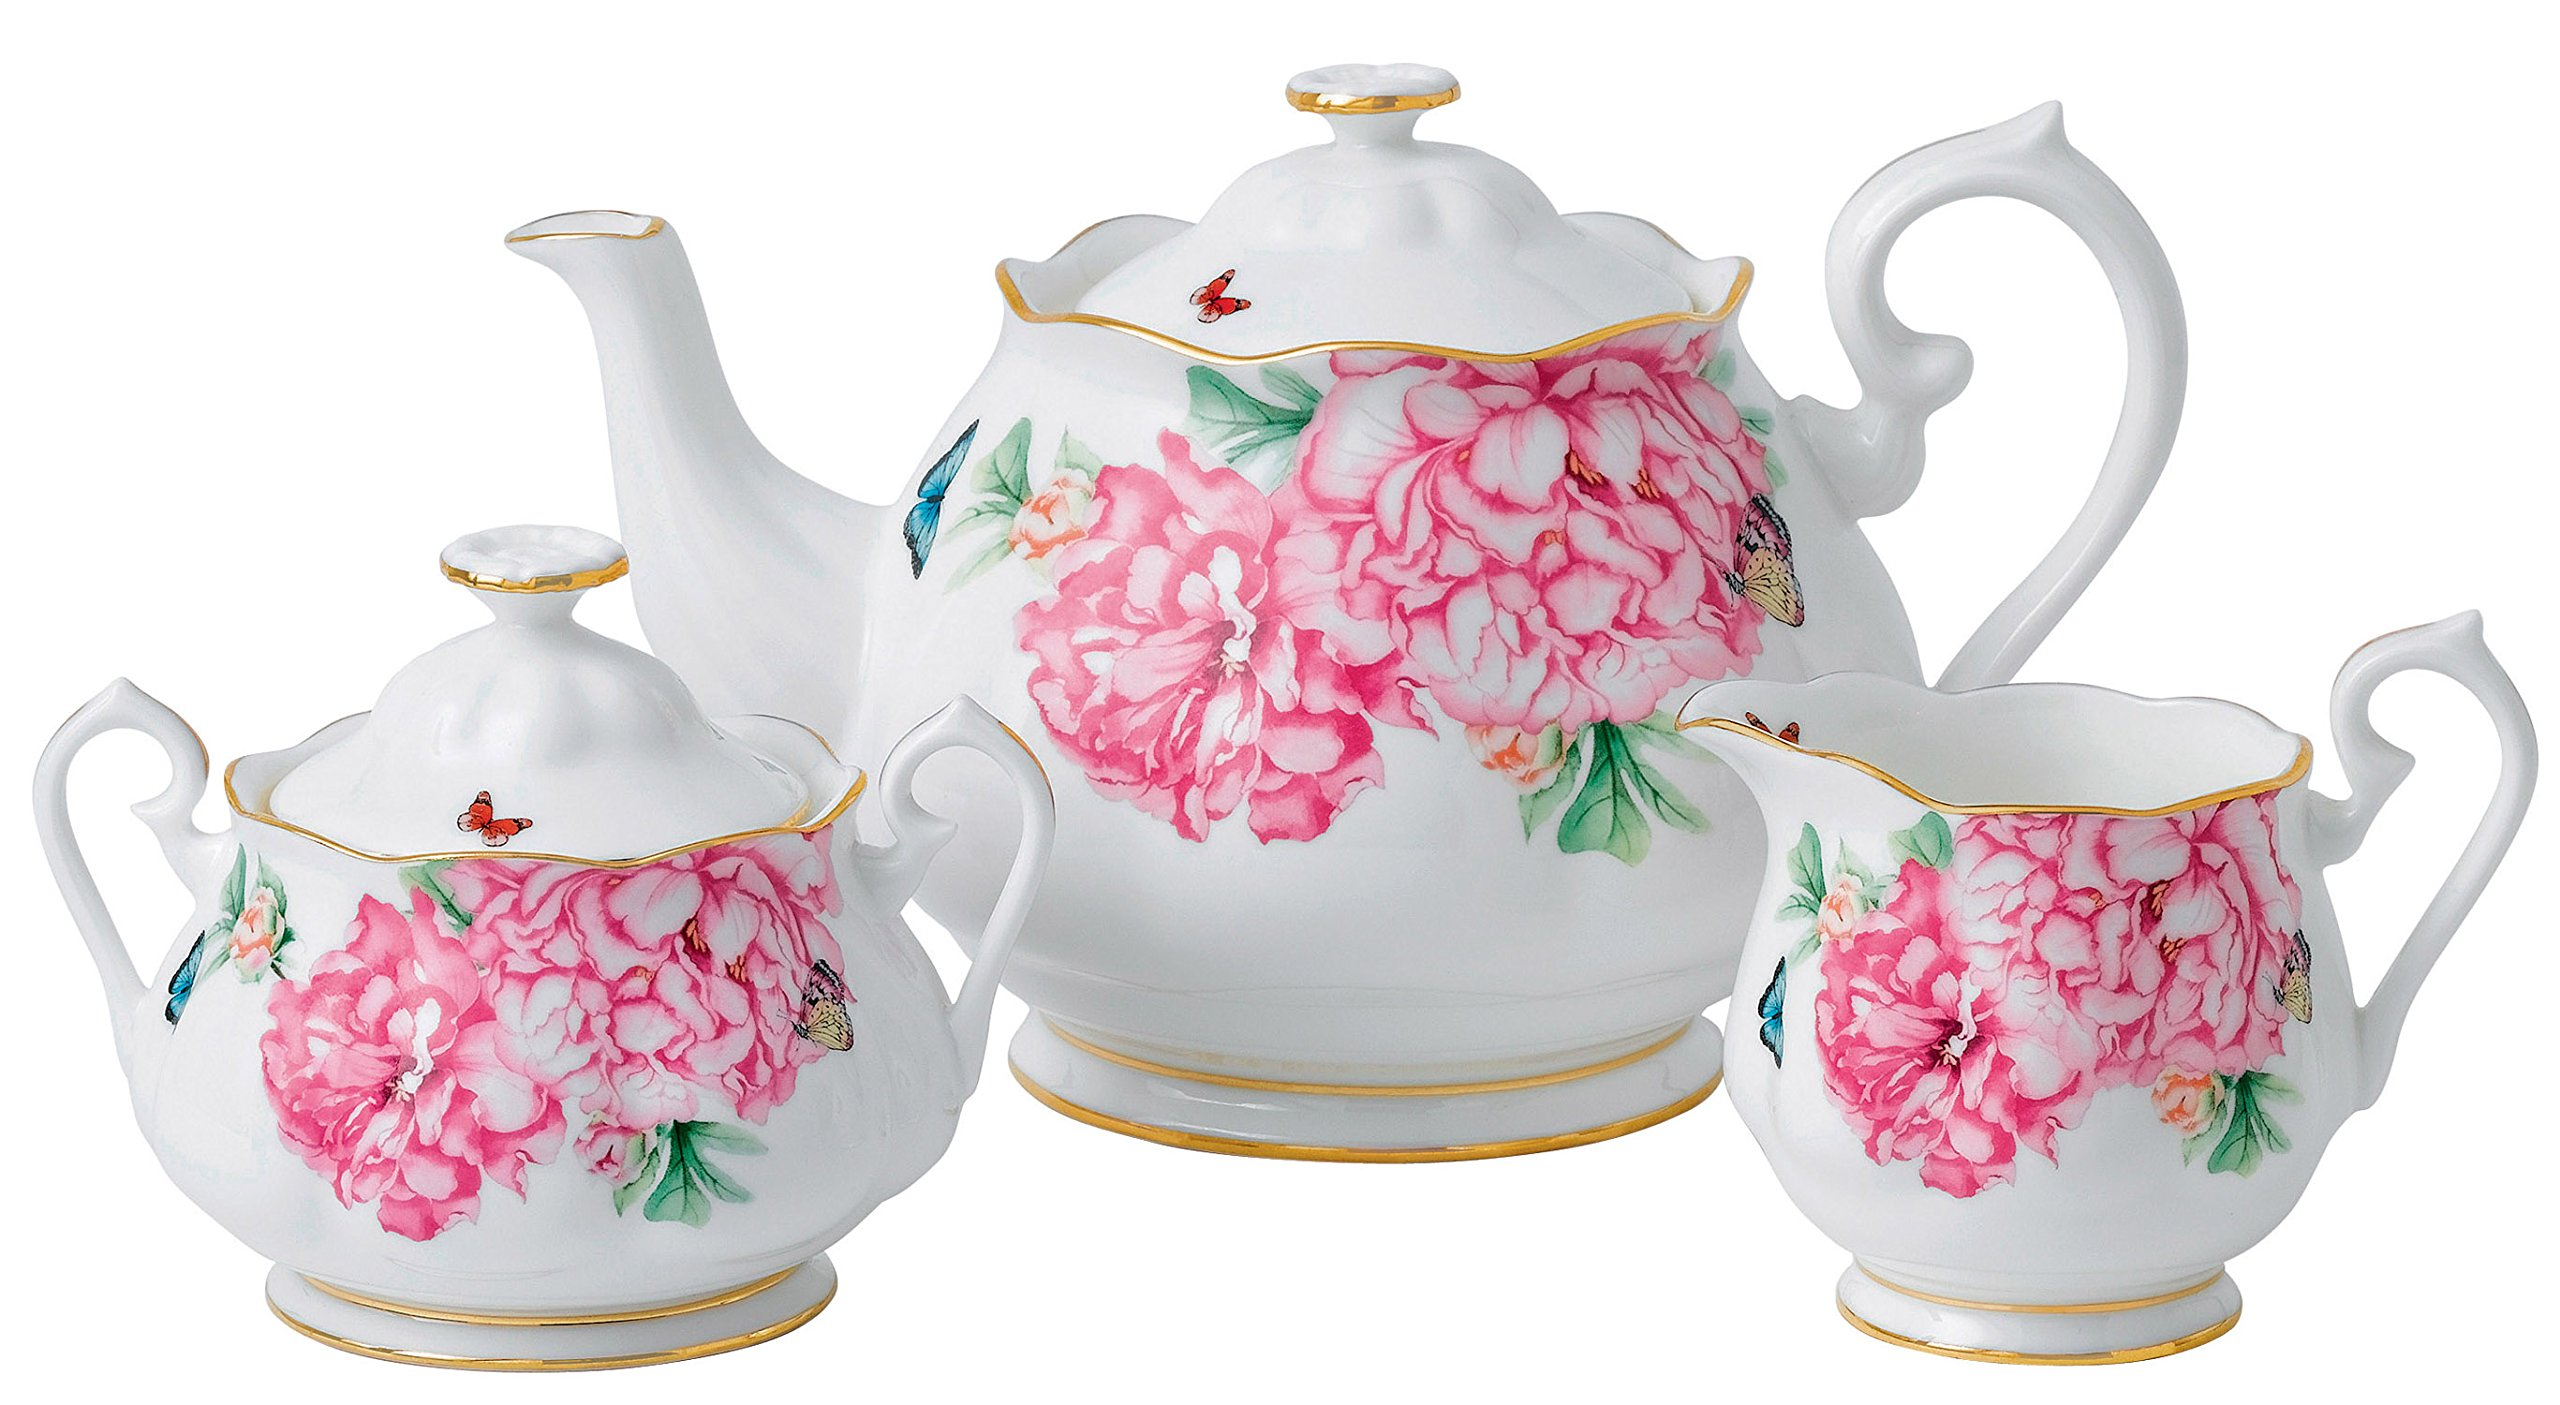 Royal Albert Friendship Teapot, Sugar and Creamer Set Designed by Miranda Kerr